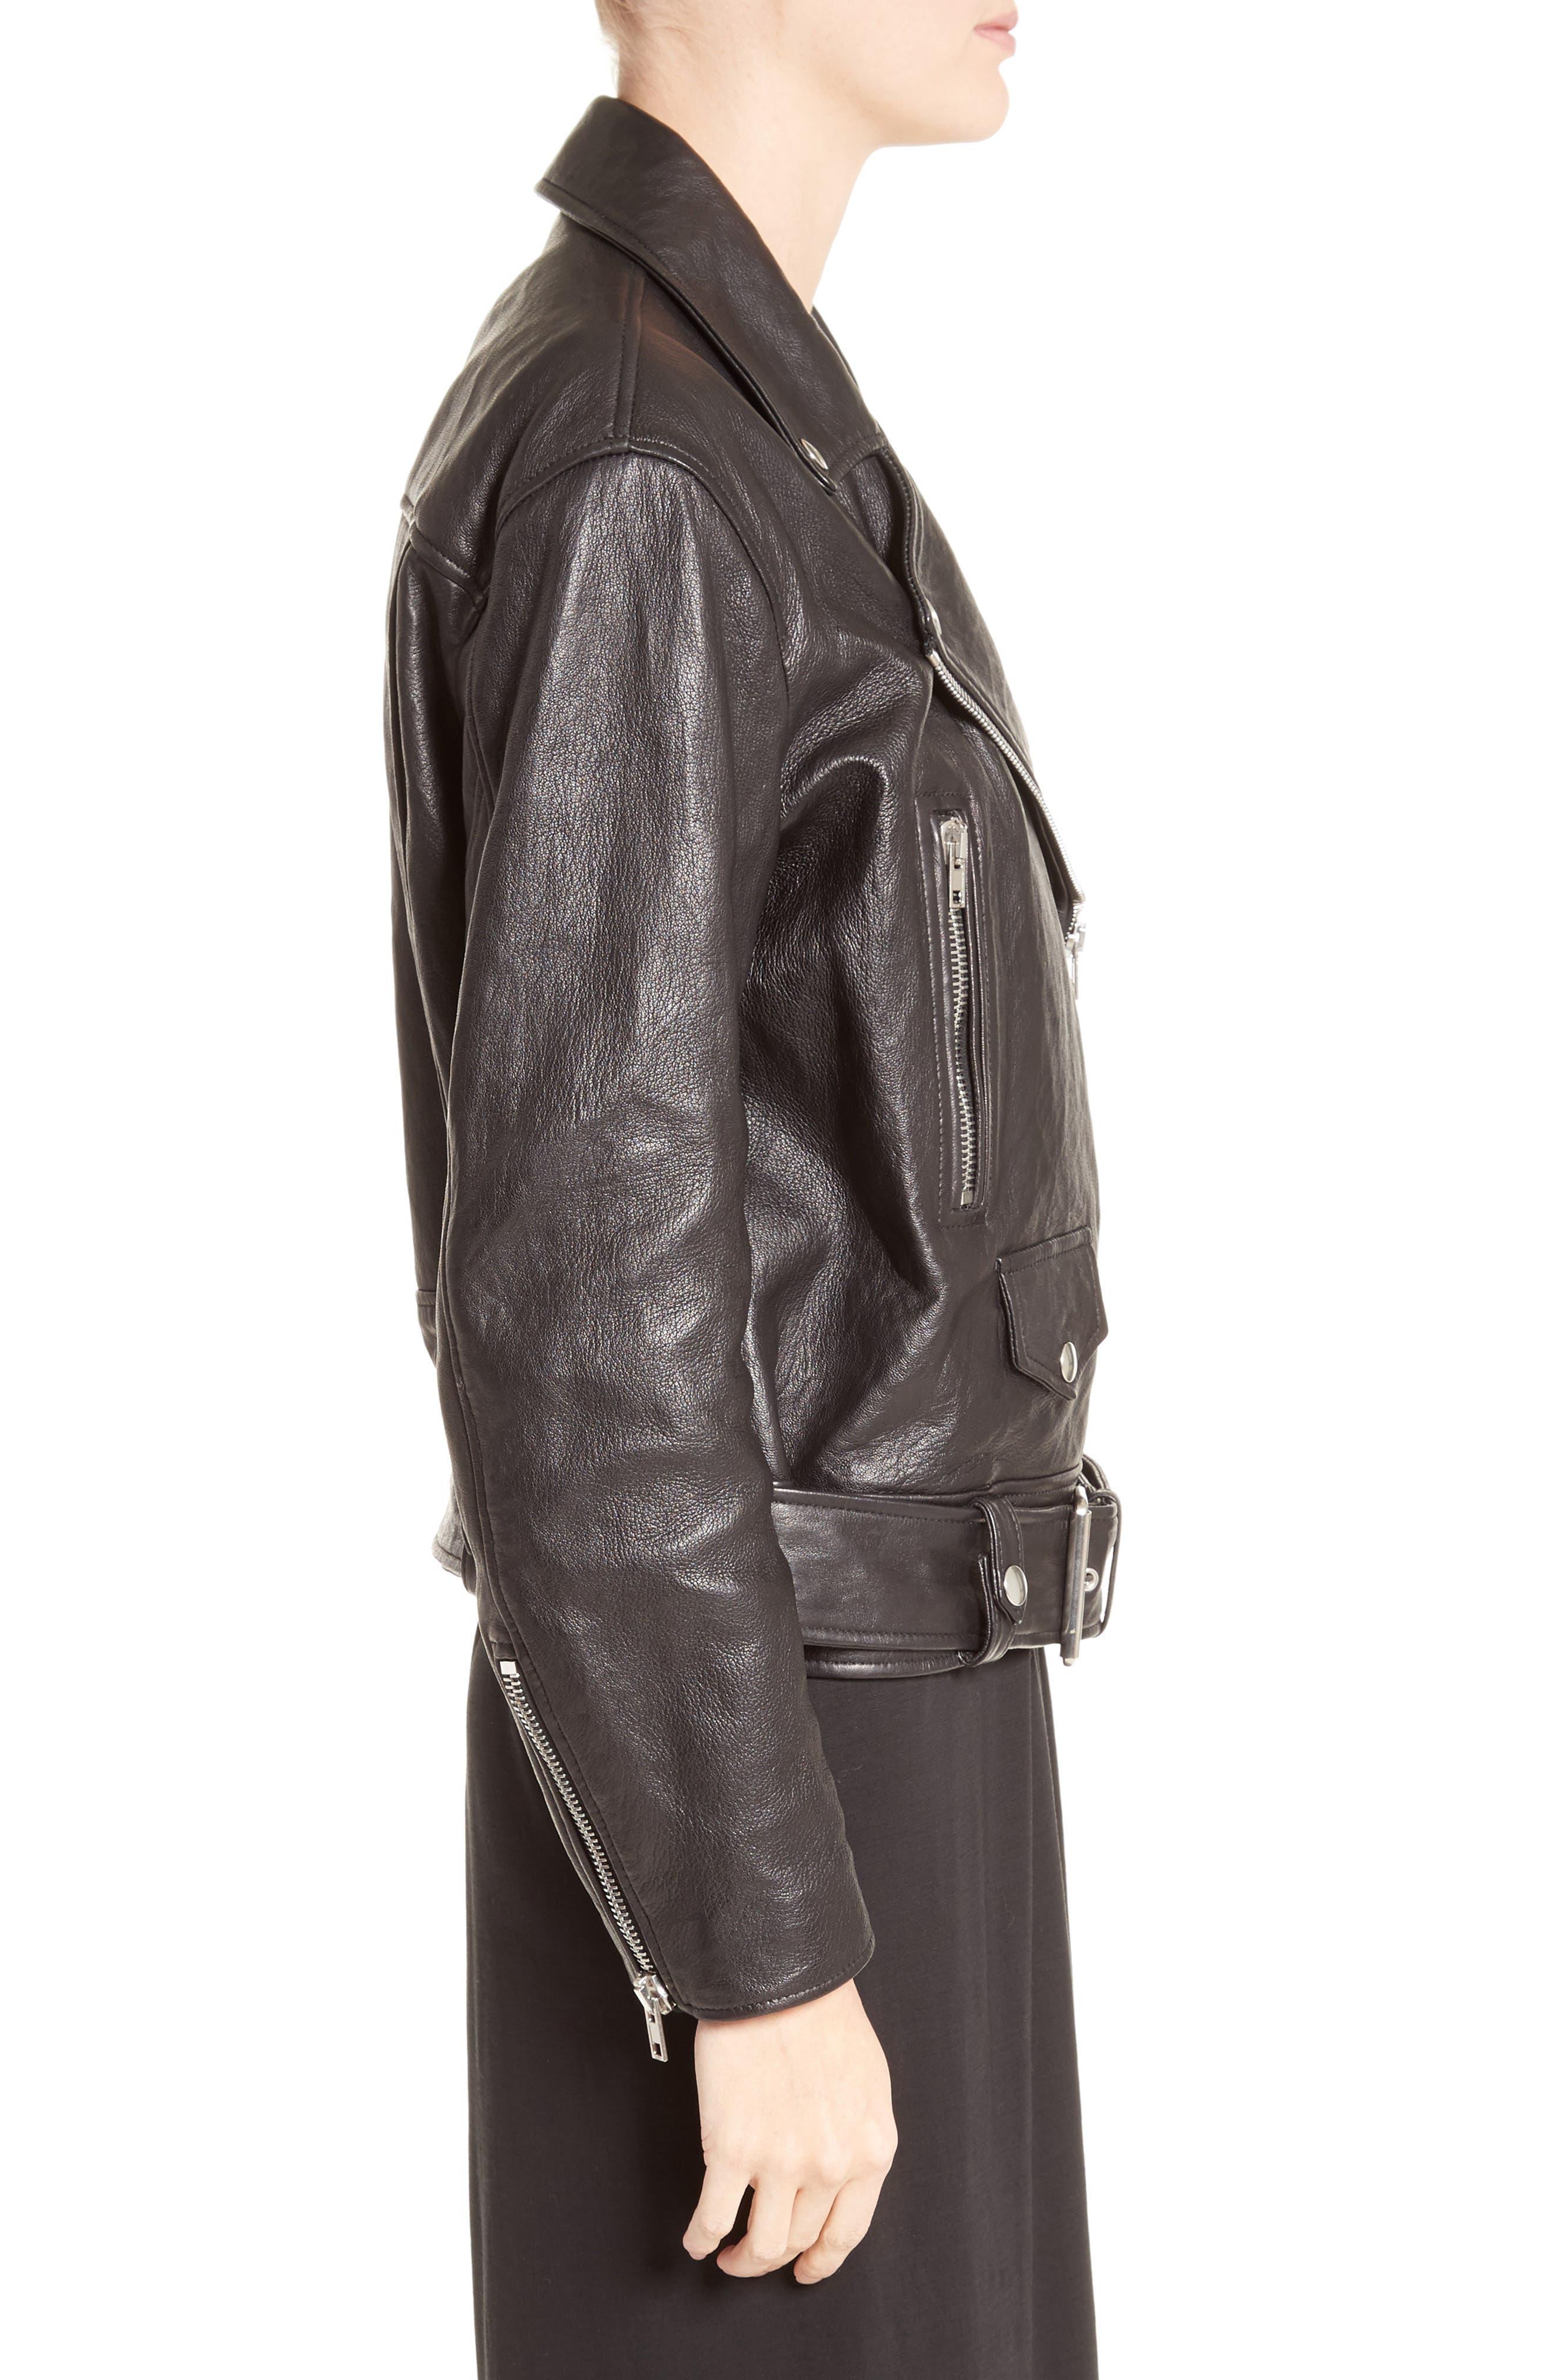 Merlyn Leather Jacket,                             Alternate thumbnail 4, color,                             Black